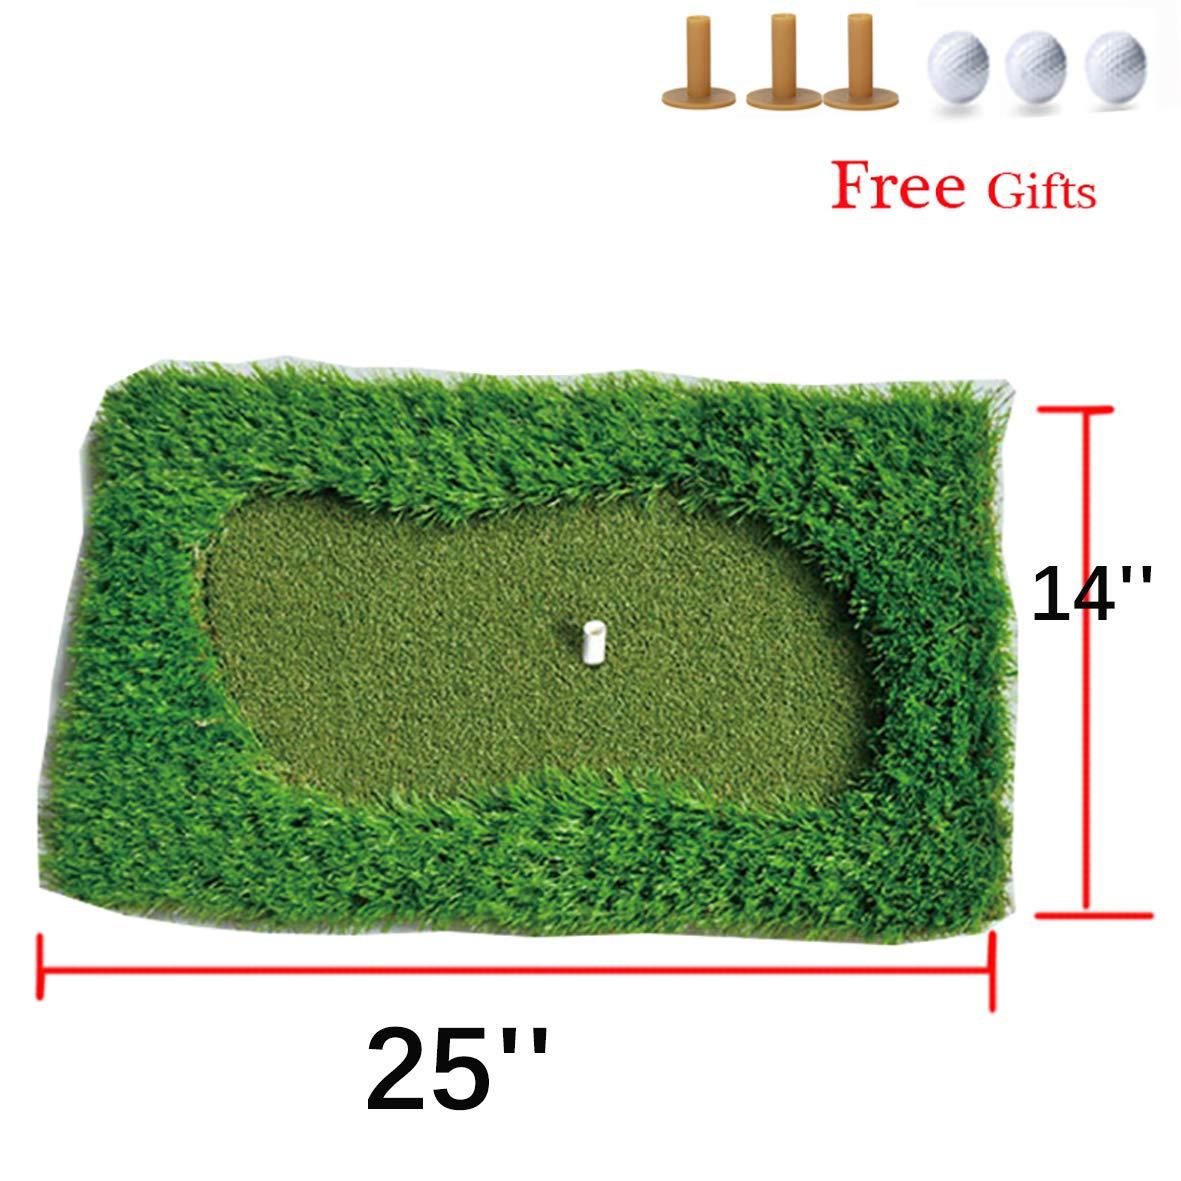 FunGreen Miniグリーンゴルフマット65 x 38 cmトレーニングHittingパッドゴム製ティーホルダーゴルフPutting PracticeマットIndoorOutdoor裏庭   B07C2TLGHM